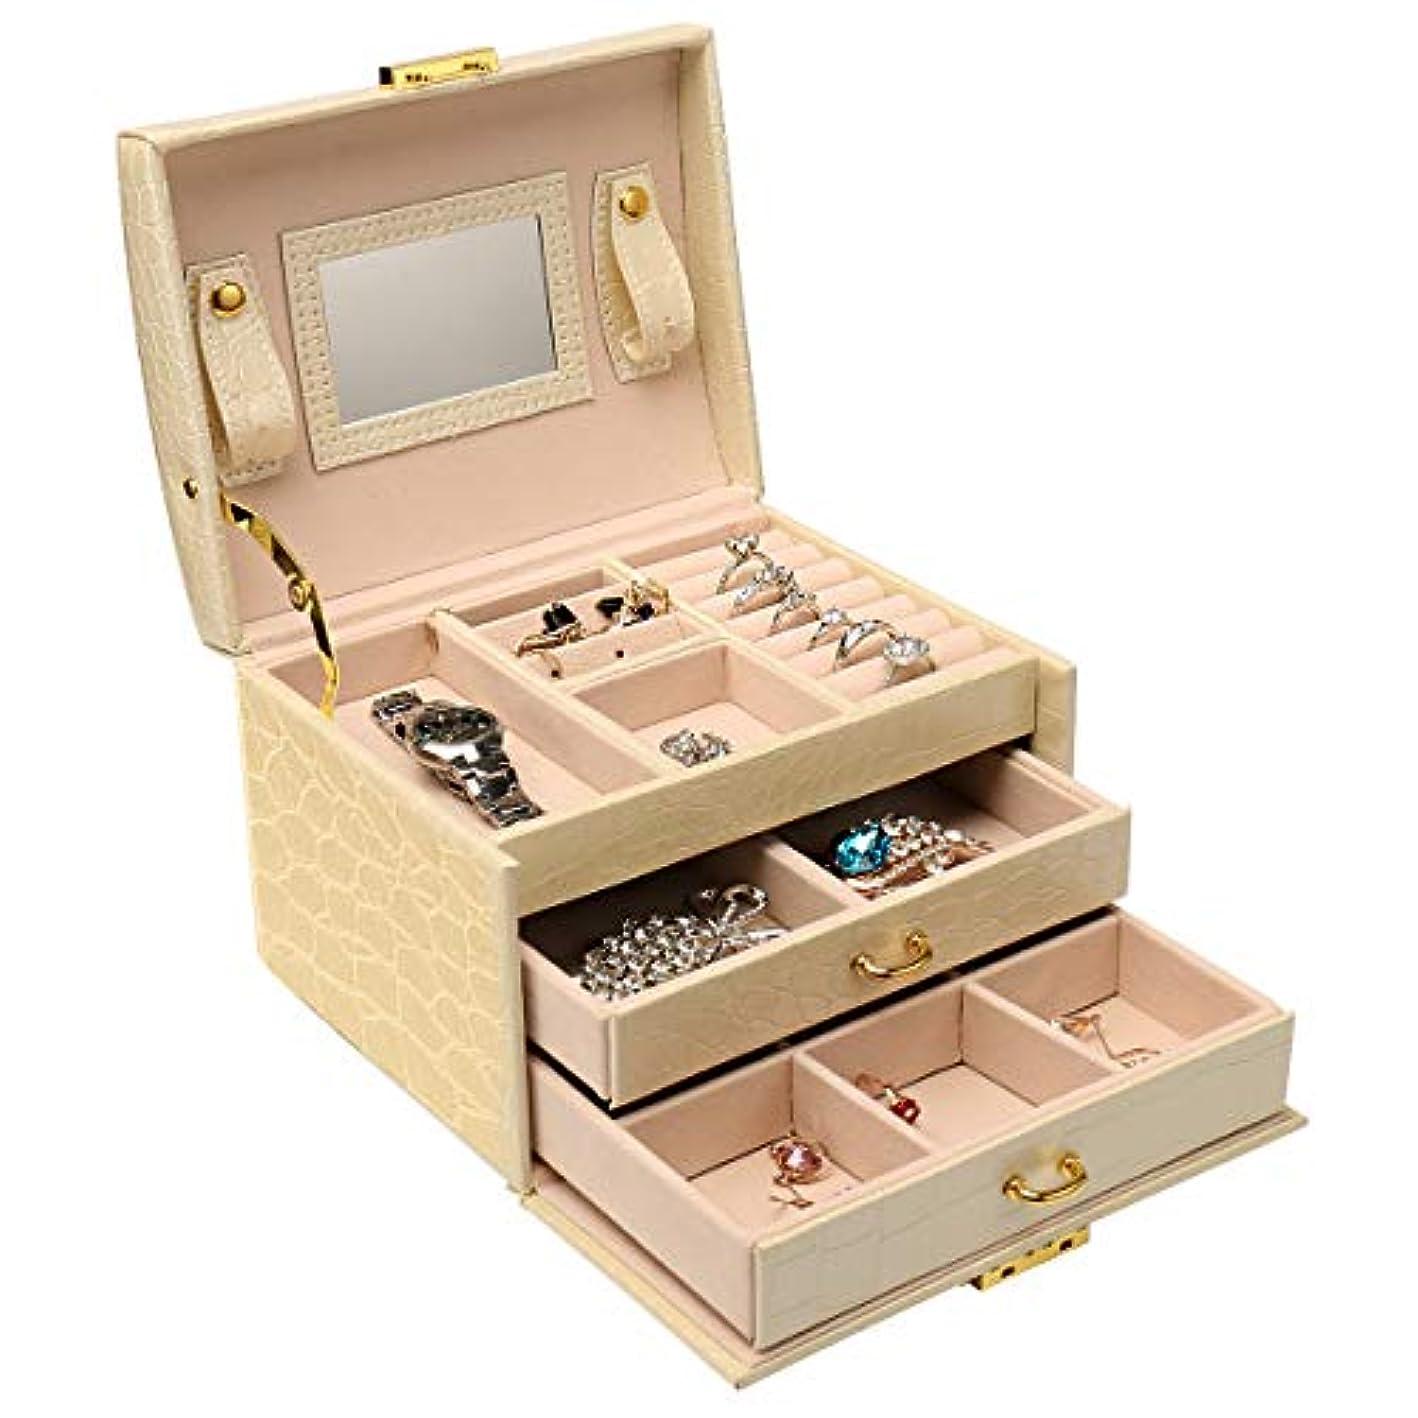 Servineart Jewelry Box Organizer Case Three-Layer Leather Jewelry Display Storage Box with Lock and Mirror 6.9